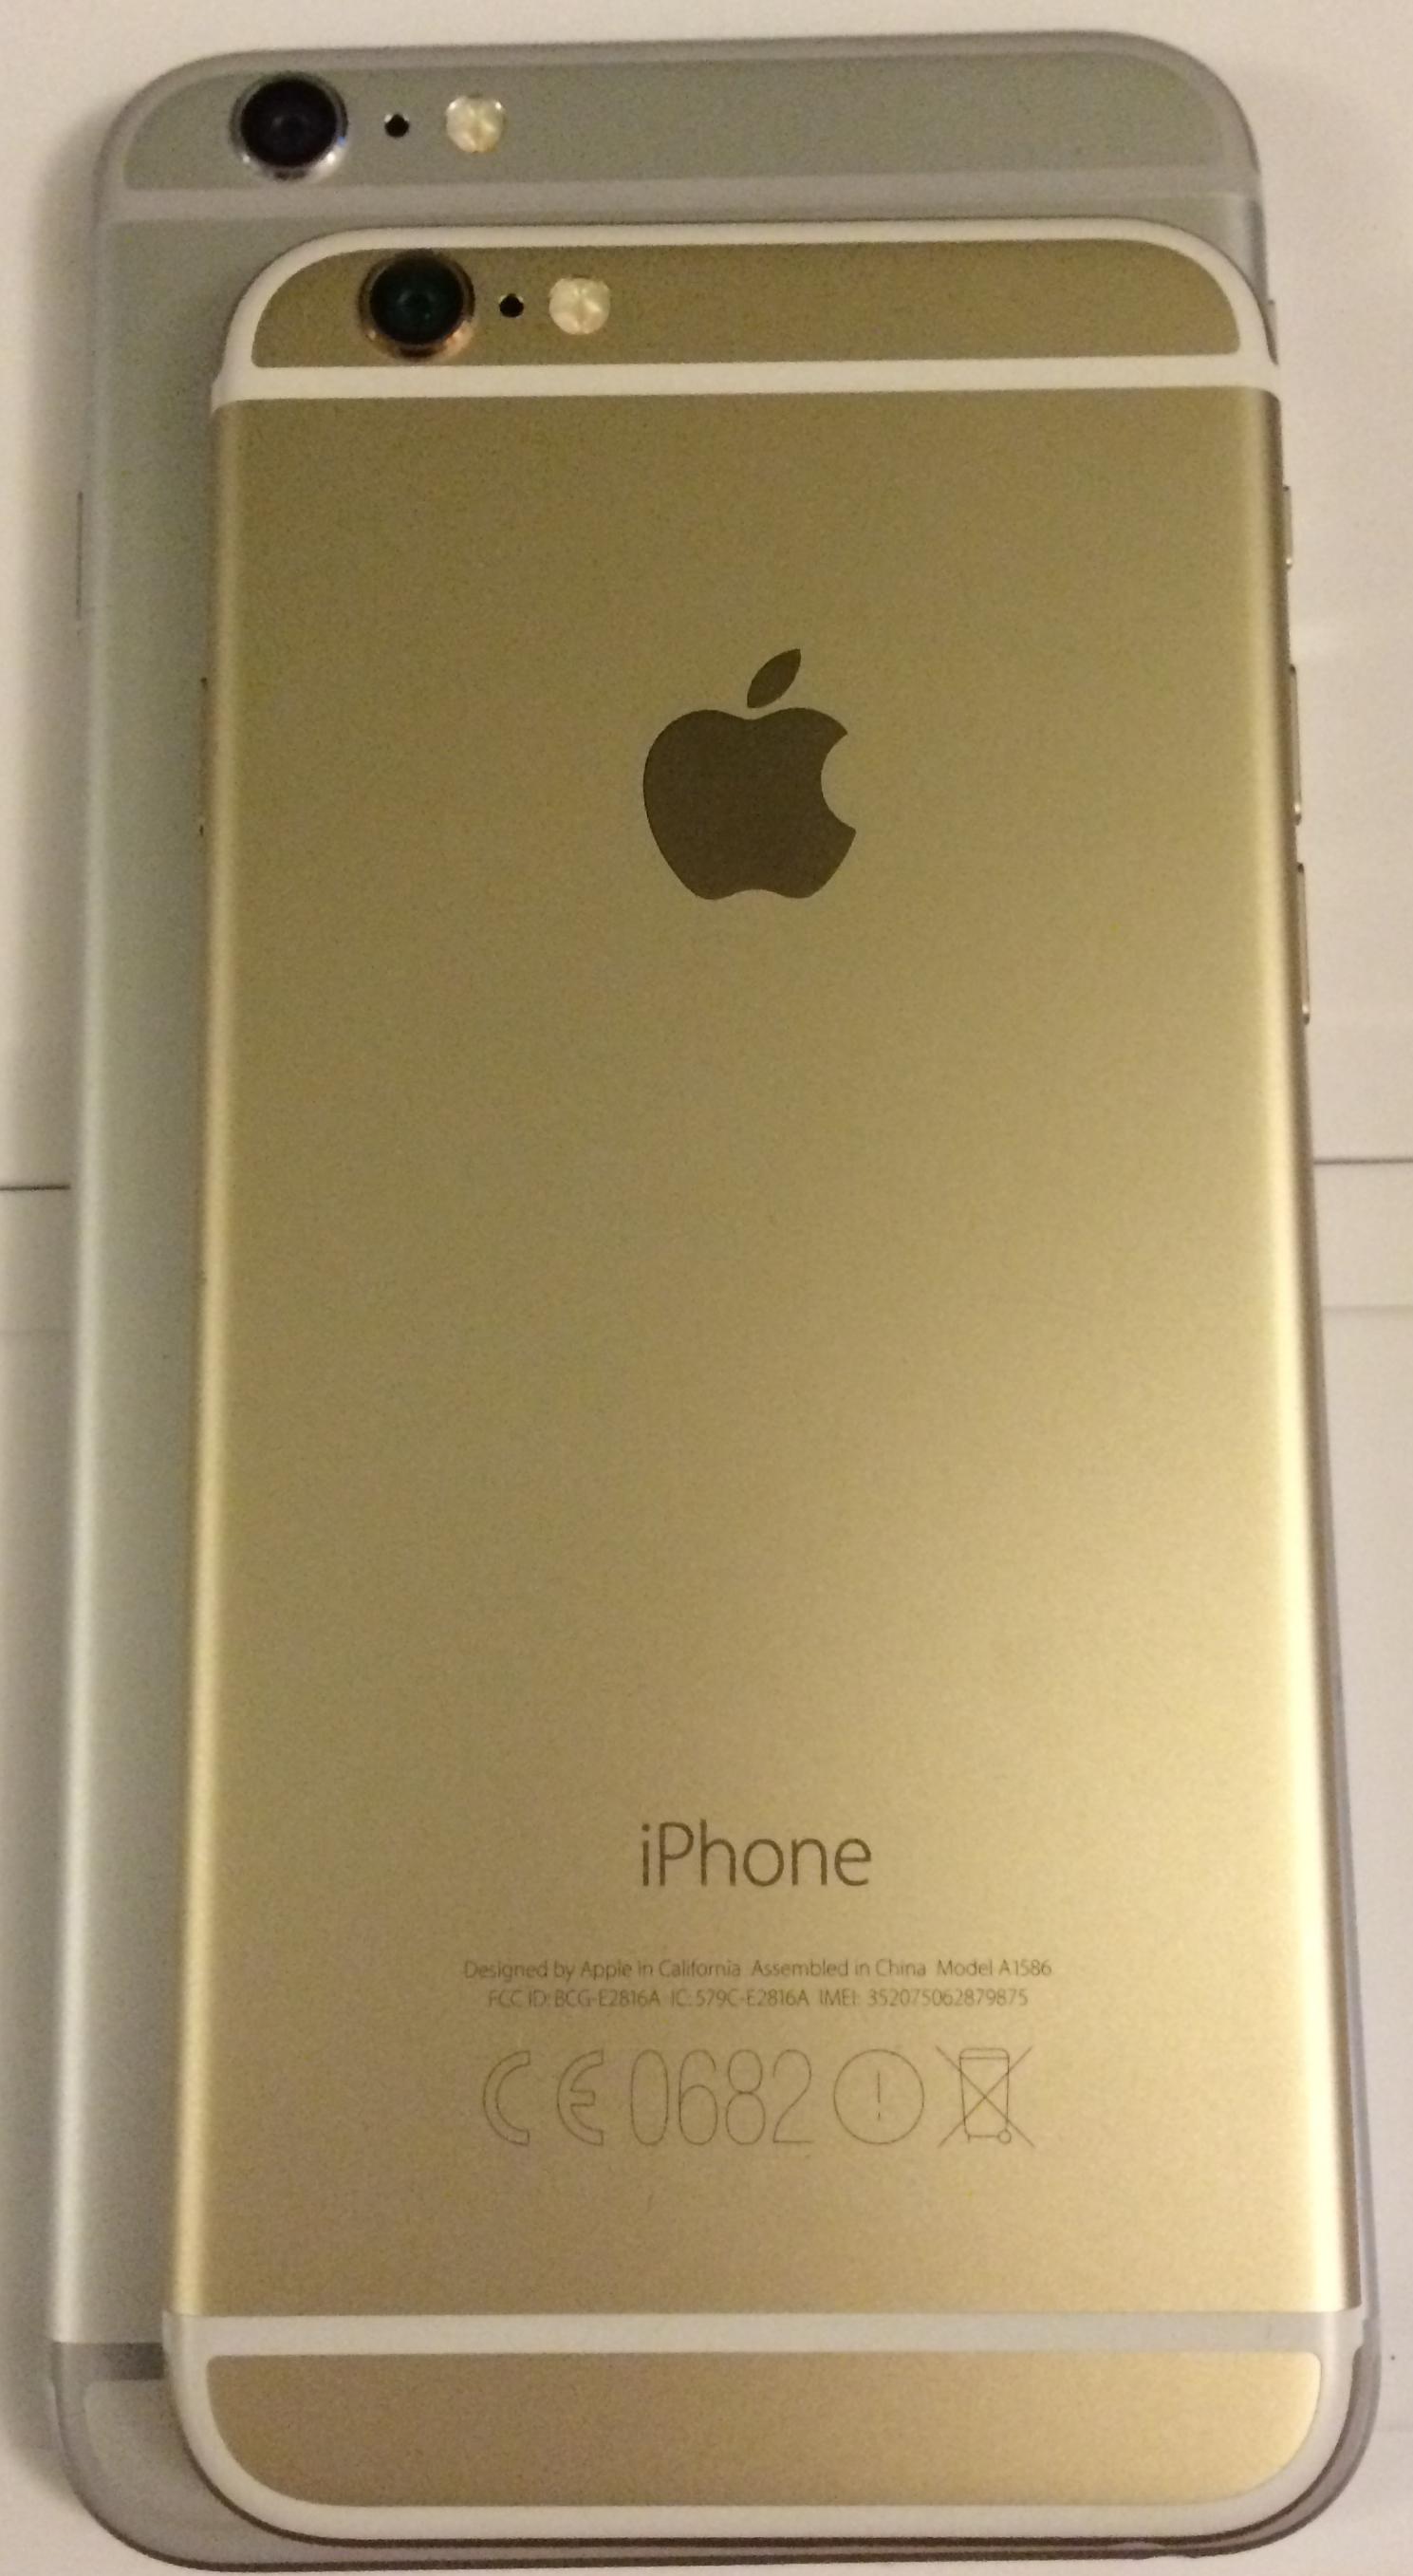 iPhone 6 vs iPhone Plus vanzari - iDevice.ro